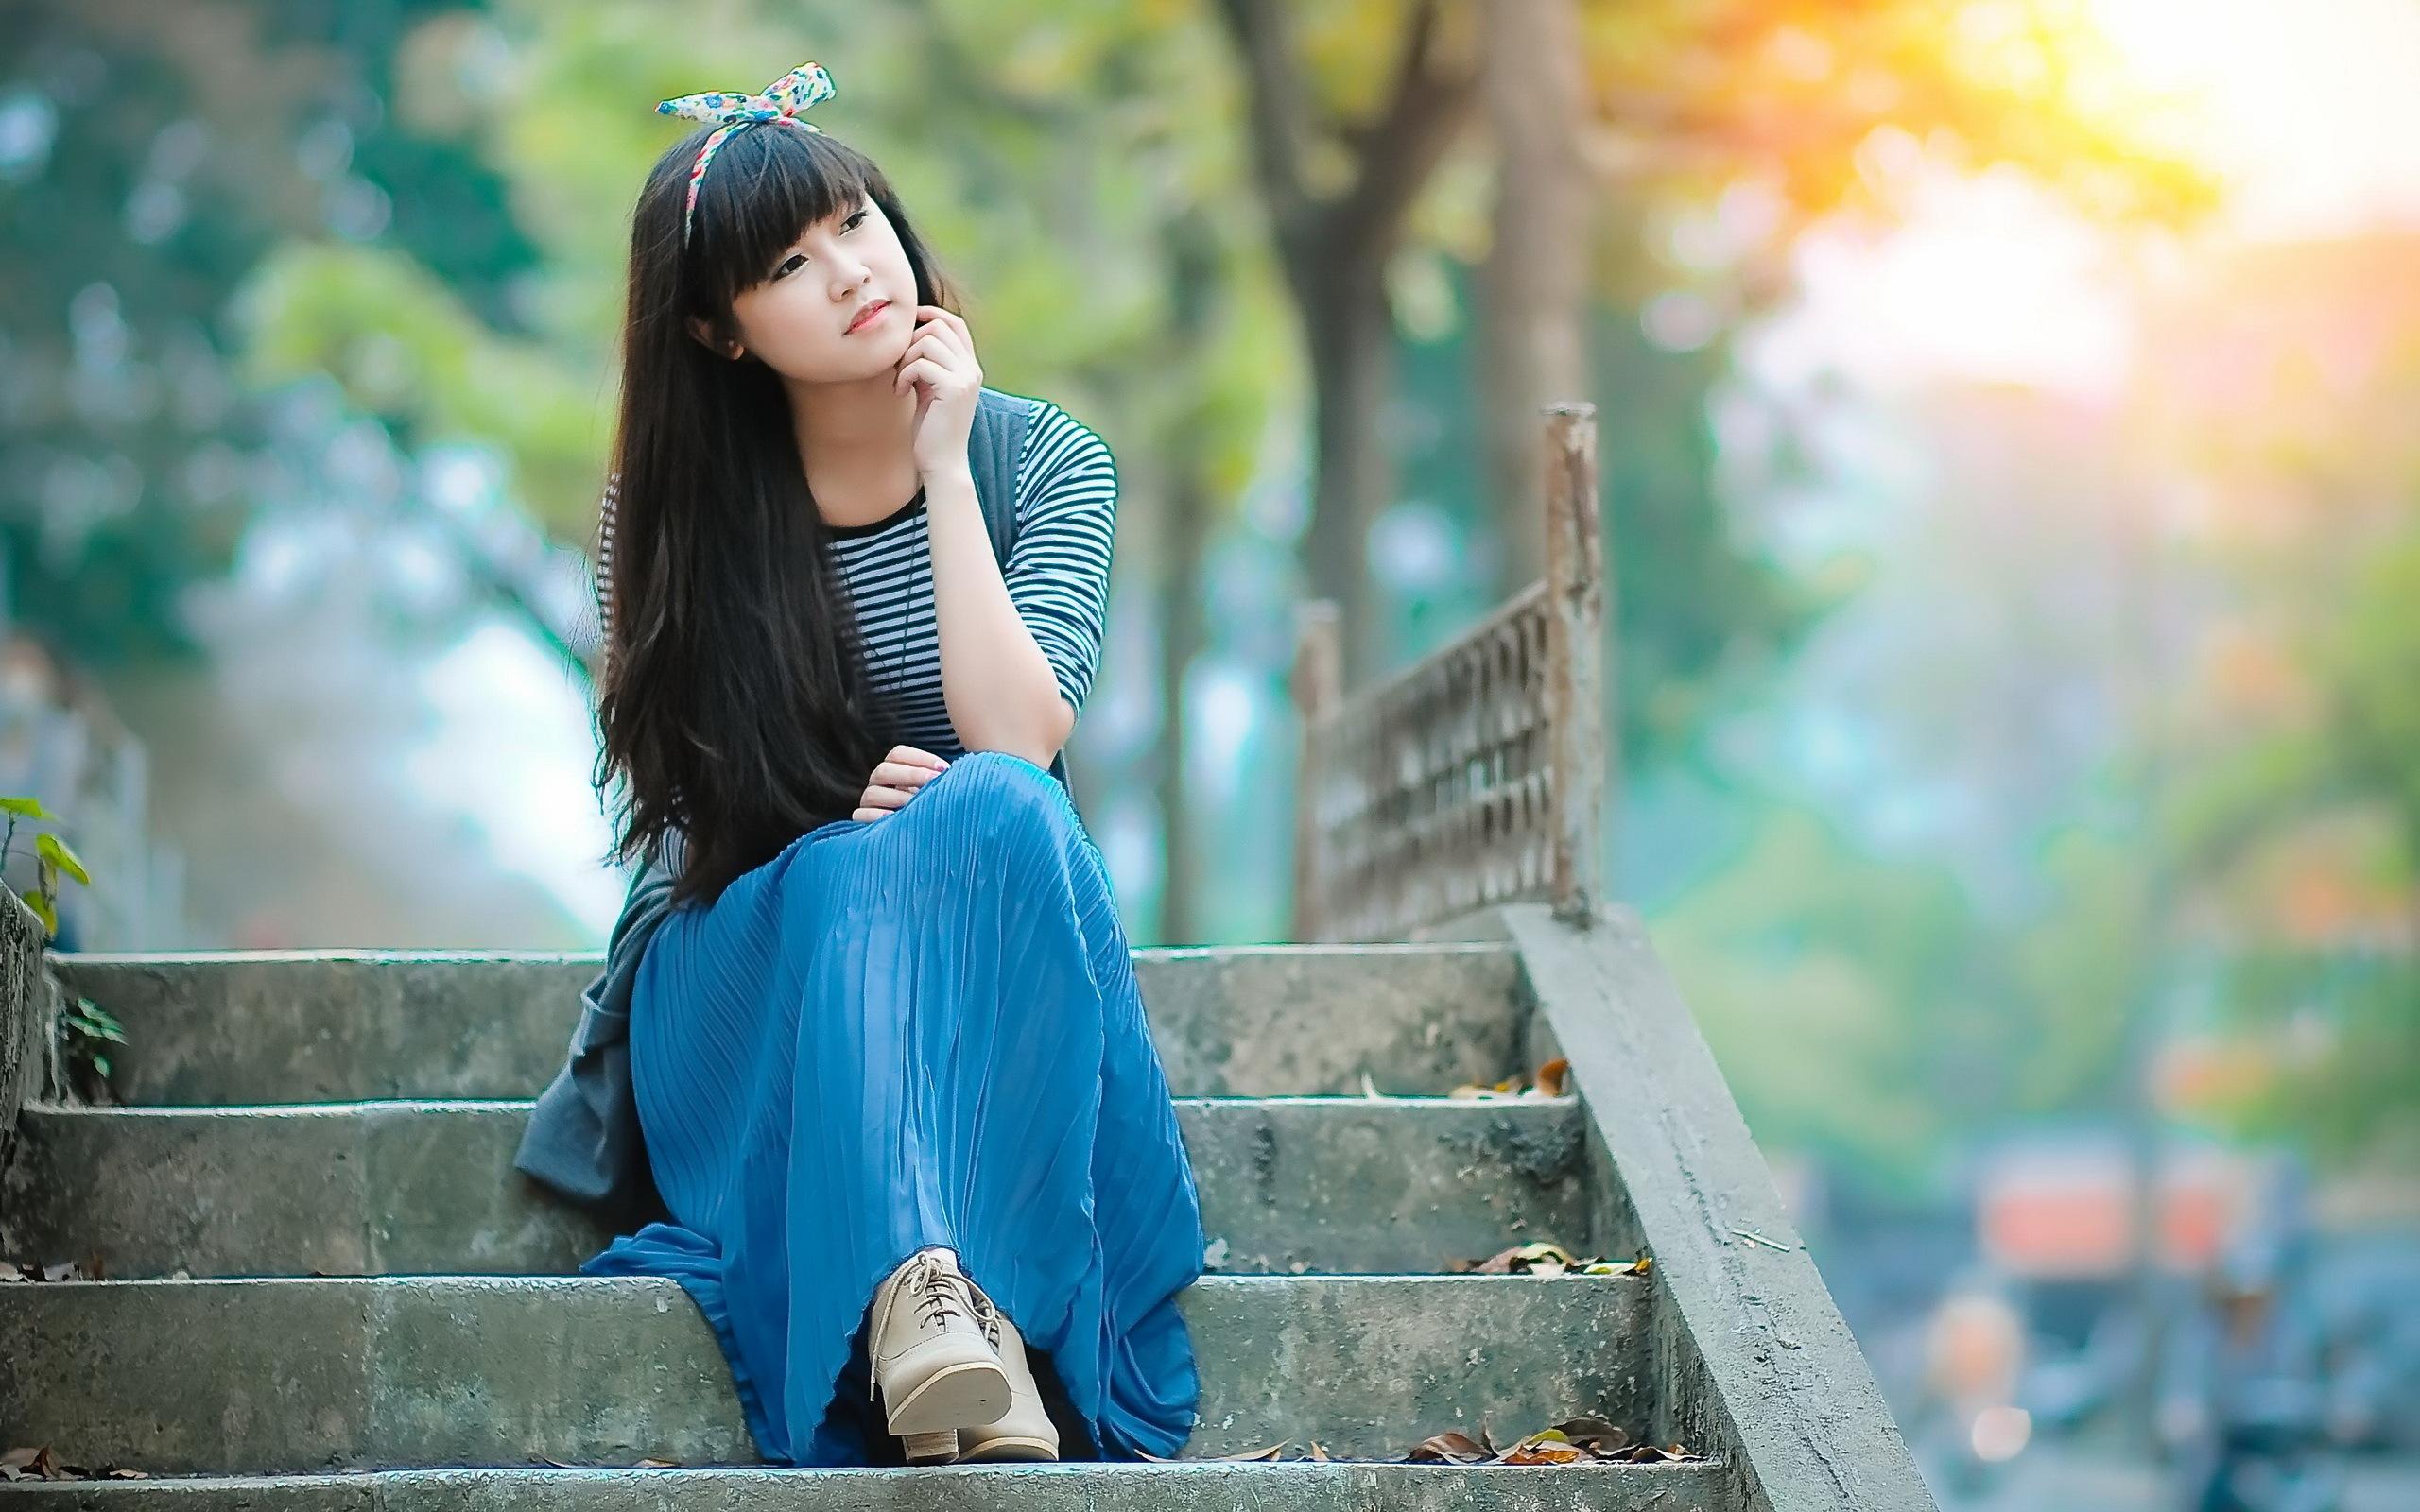 Stylish Girl Wallpaper Hd 1080p Asian Full Hd Wallpaper And Background Image 2560x1600